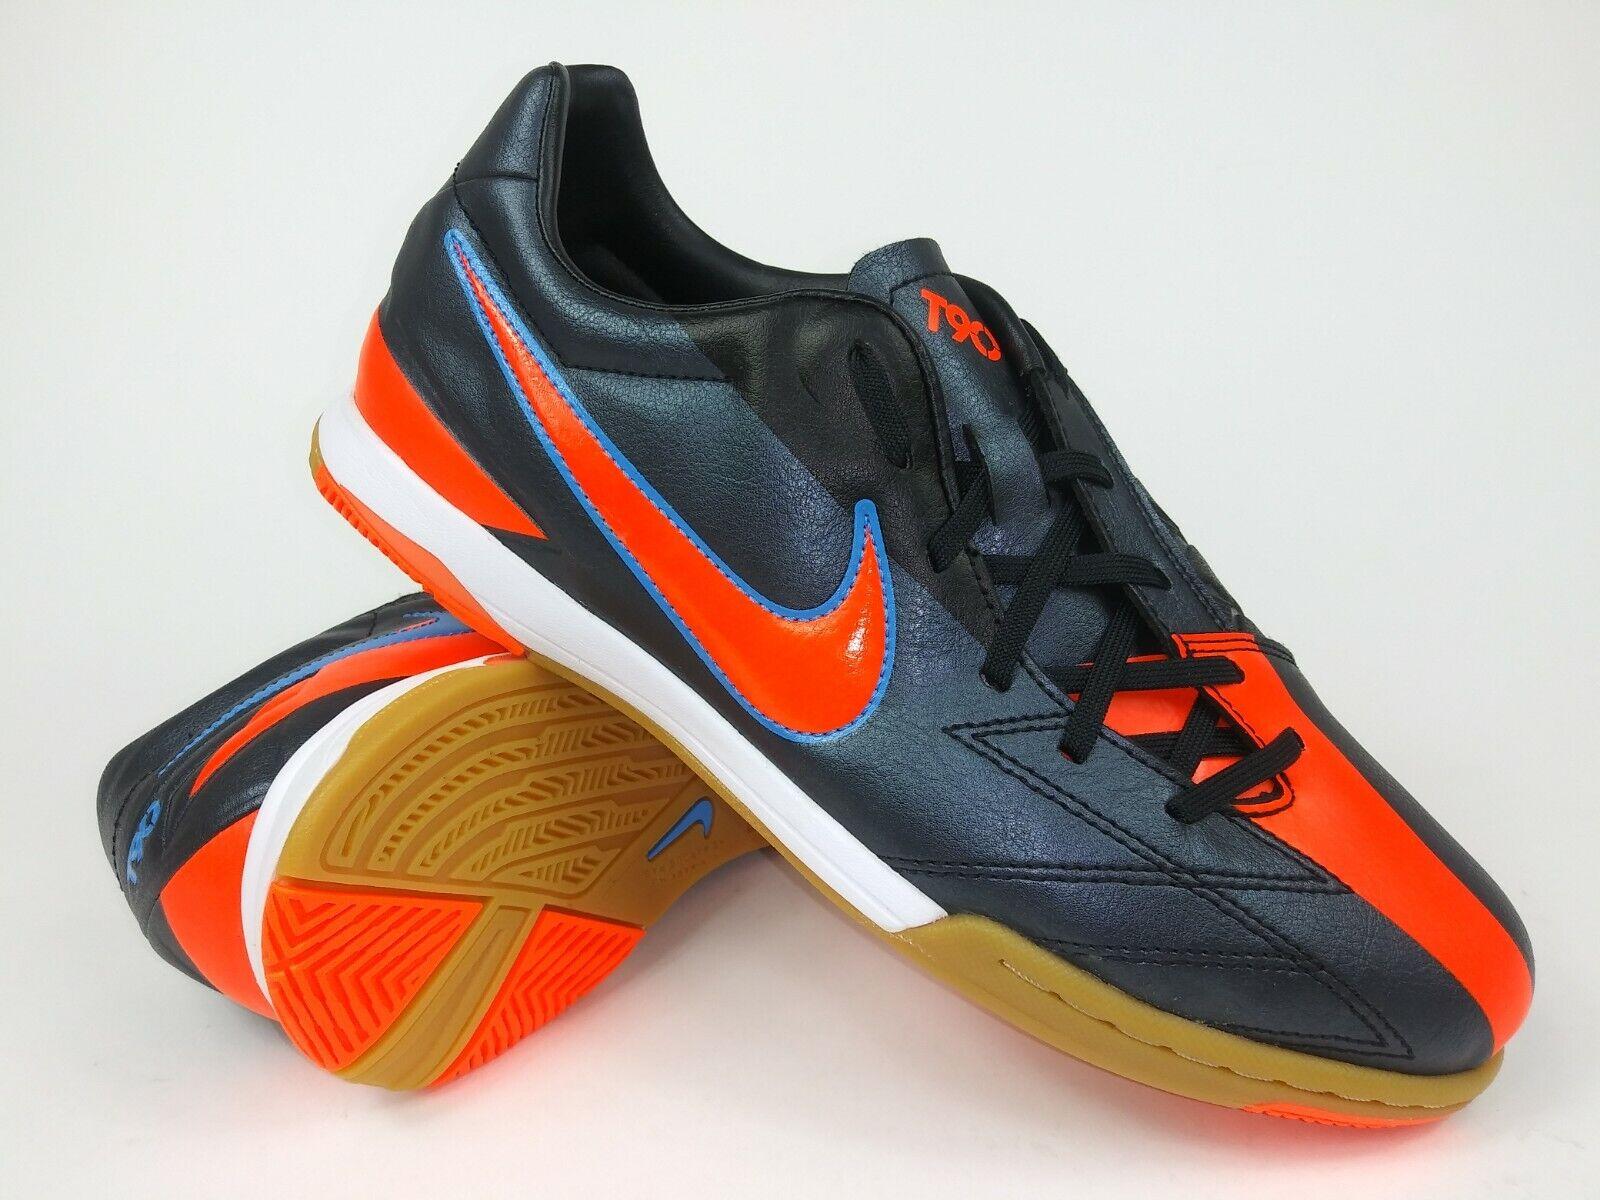 Nike Hombre Rareza T90 Dispara IV Ic 472558-084 Naranja y Negro Interiores